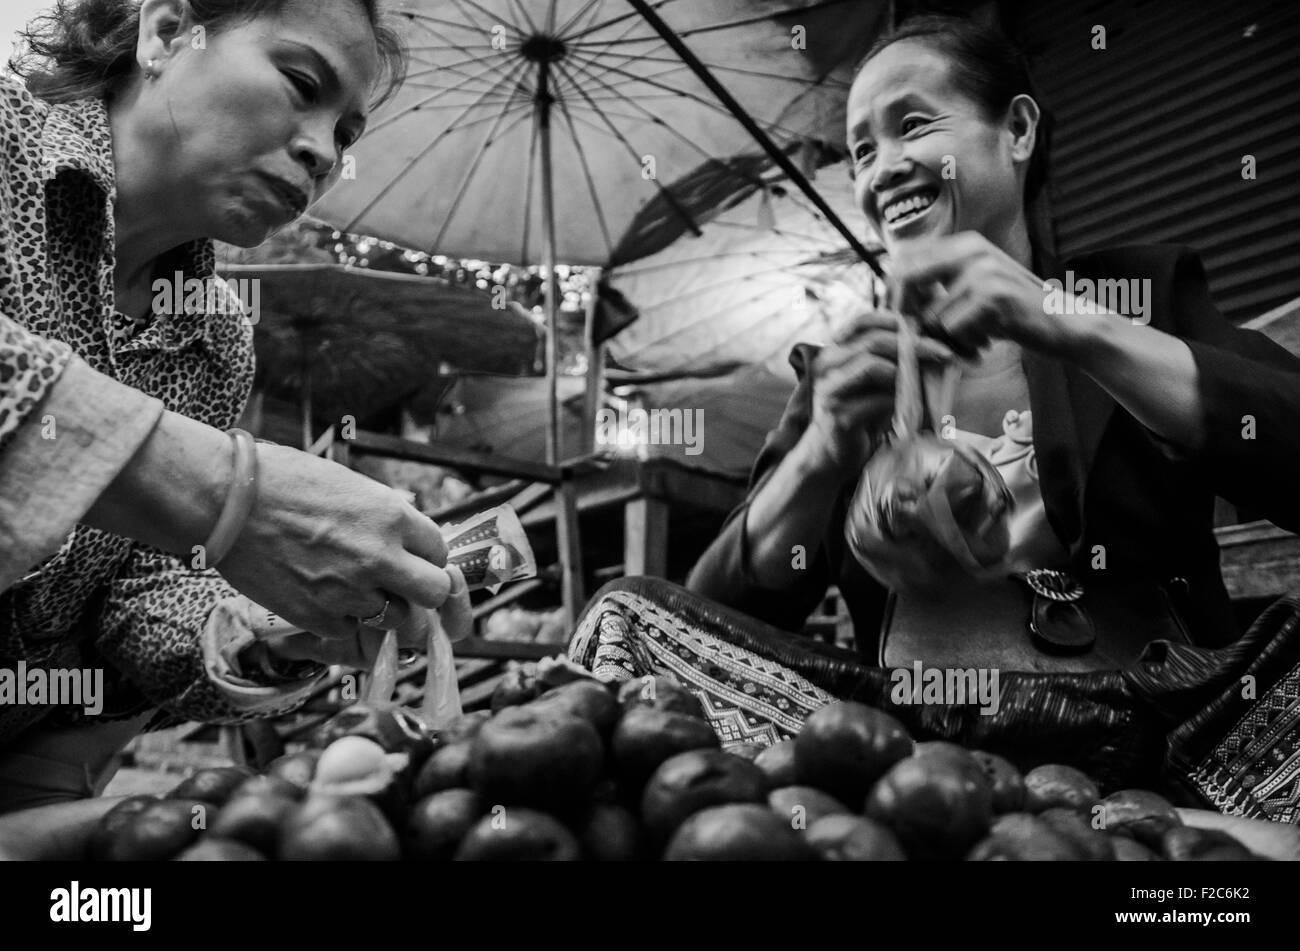 Luang Prabang, Laos. 3rd Apr, 2014. Luang Prabang, Laos - April 3 2014: (EDITORIAL USE ONLY. CHINA OUT) Giving and - Stock Image